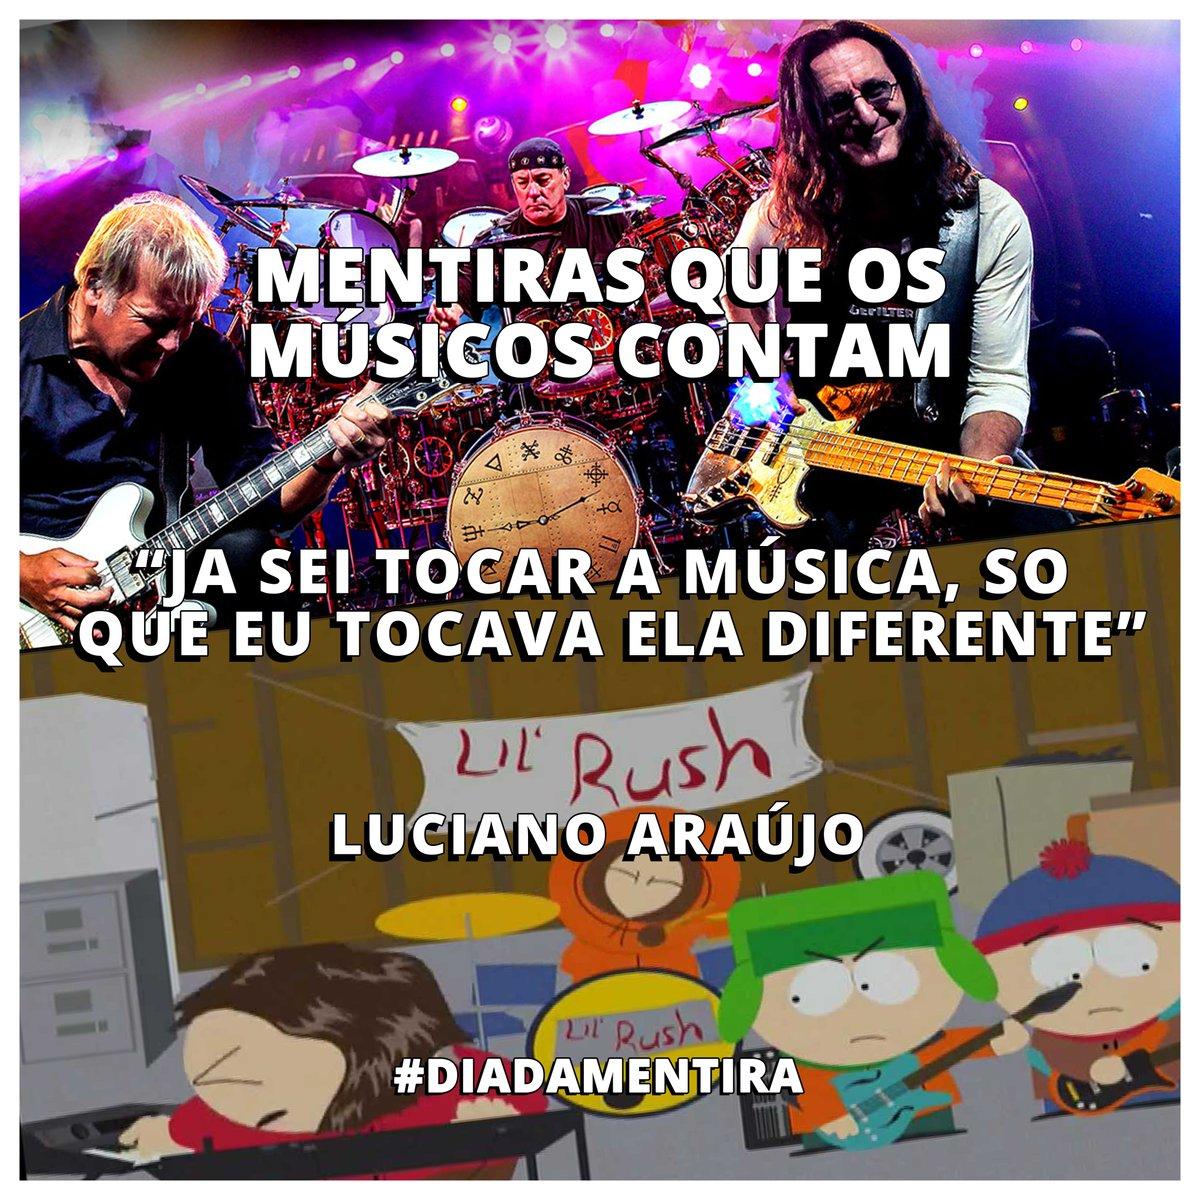 Todo mundo finge que acredita! Luciano Araújo #diadamentira #music https://t.co/svRzKZYWCY